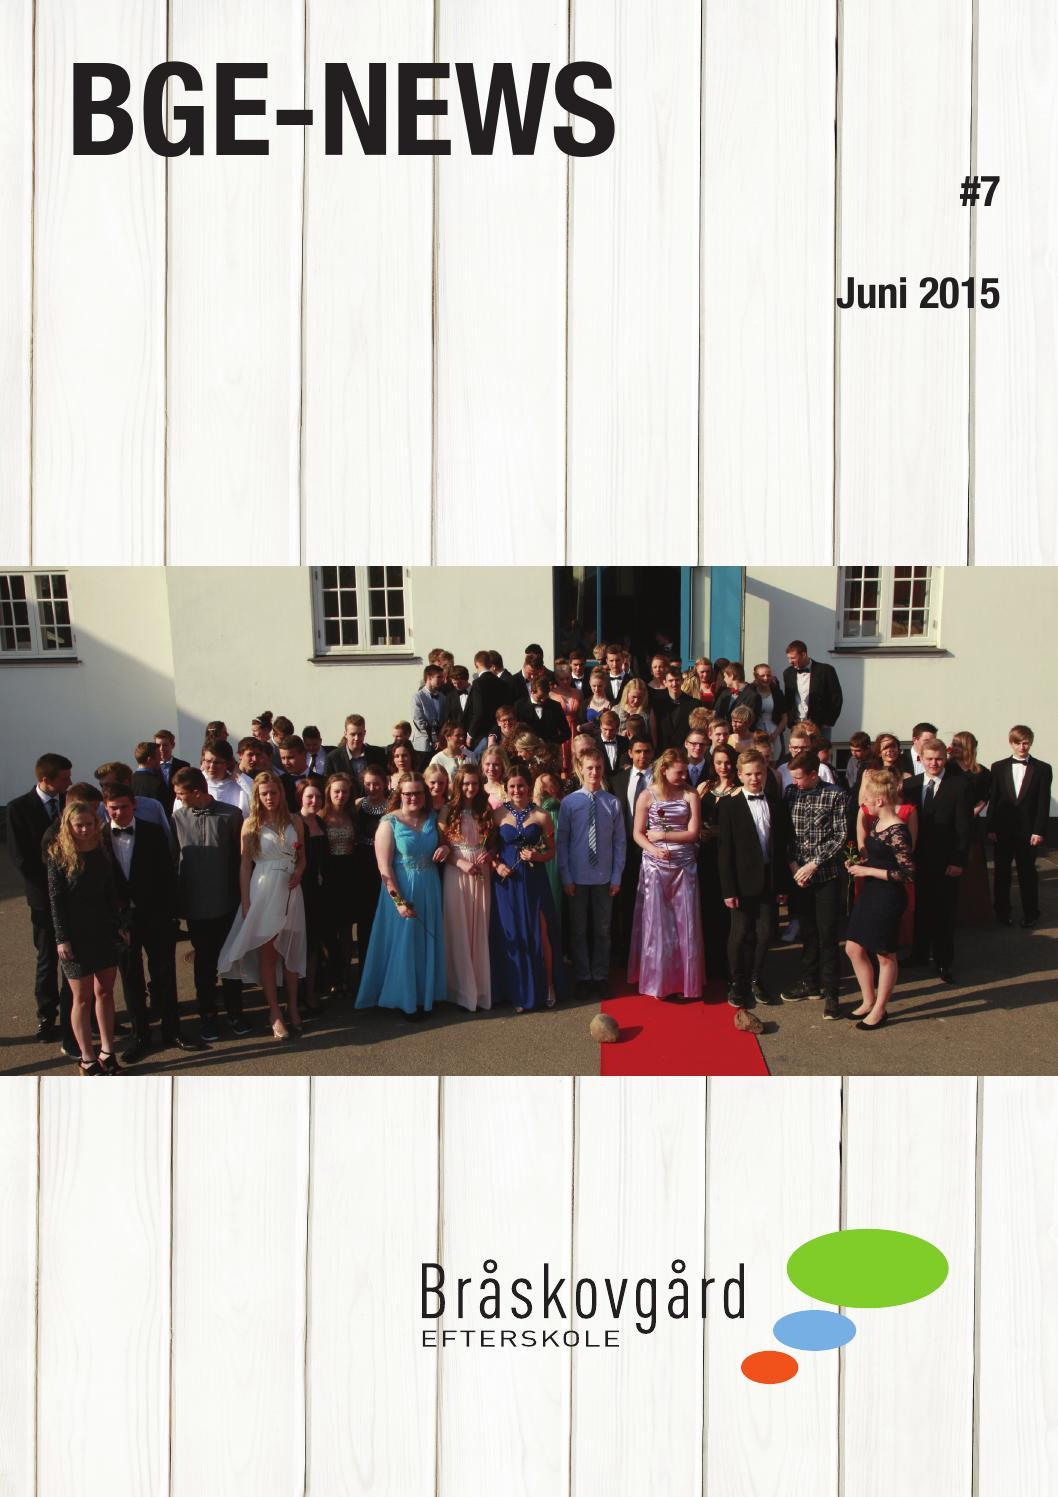 Bge News 7 By Henrik Beierholm Issuu